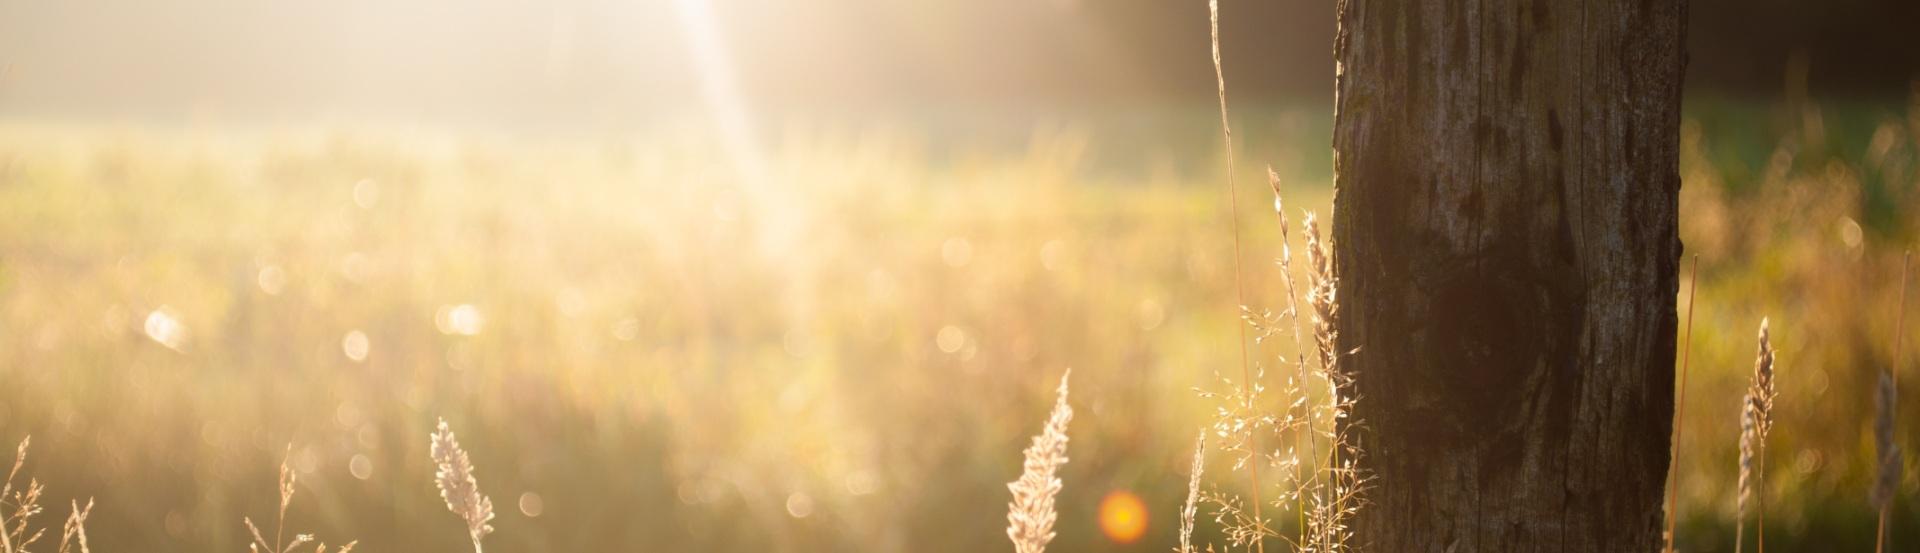 sun-trees_bearb